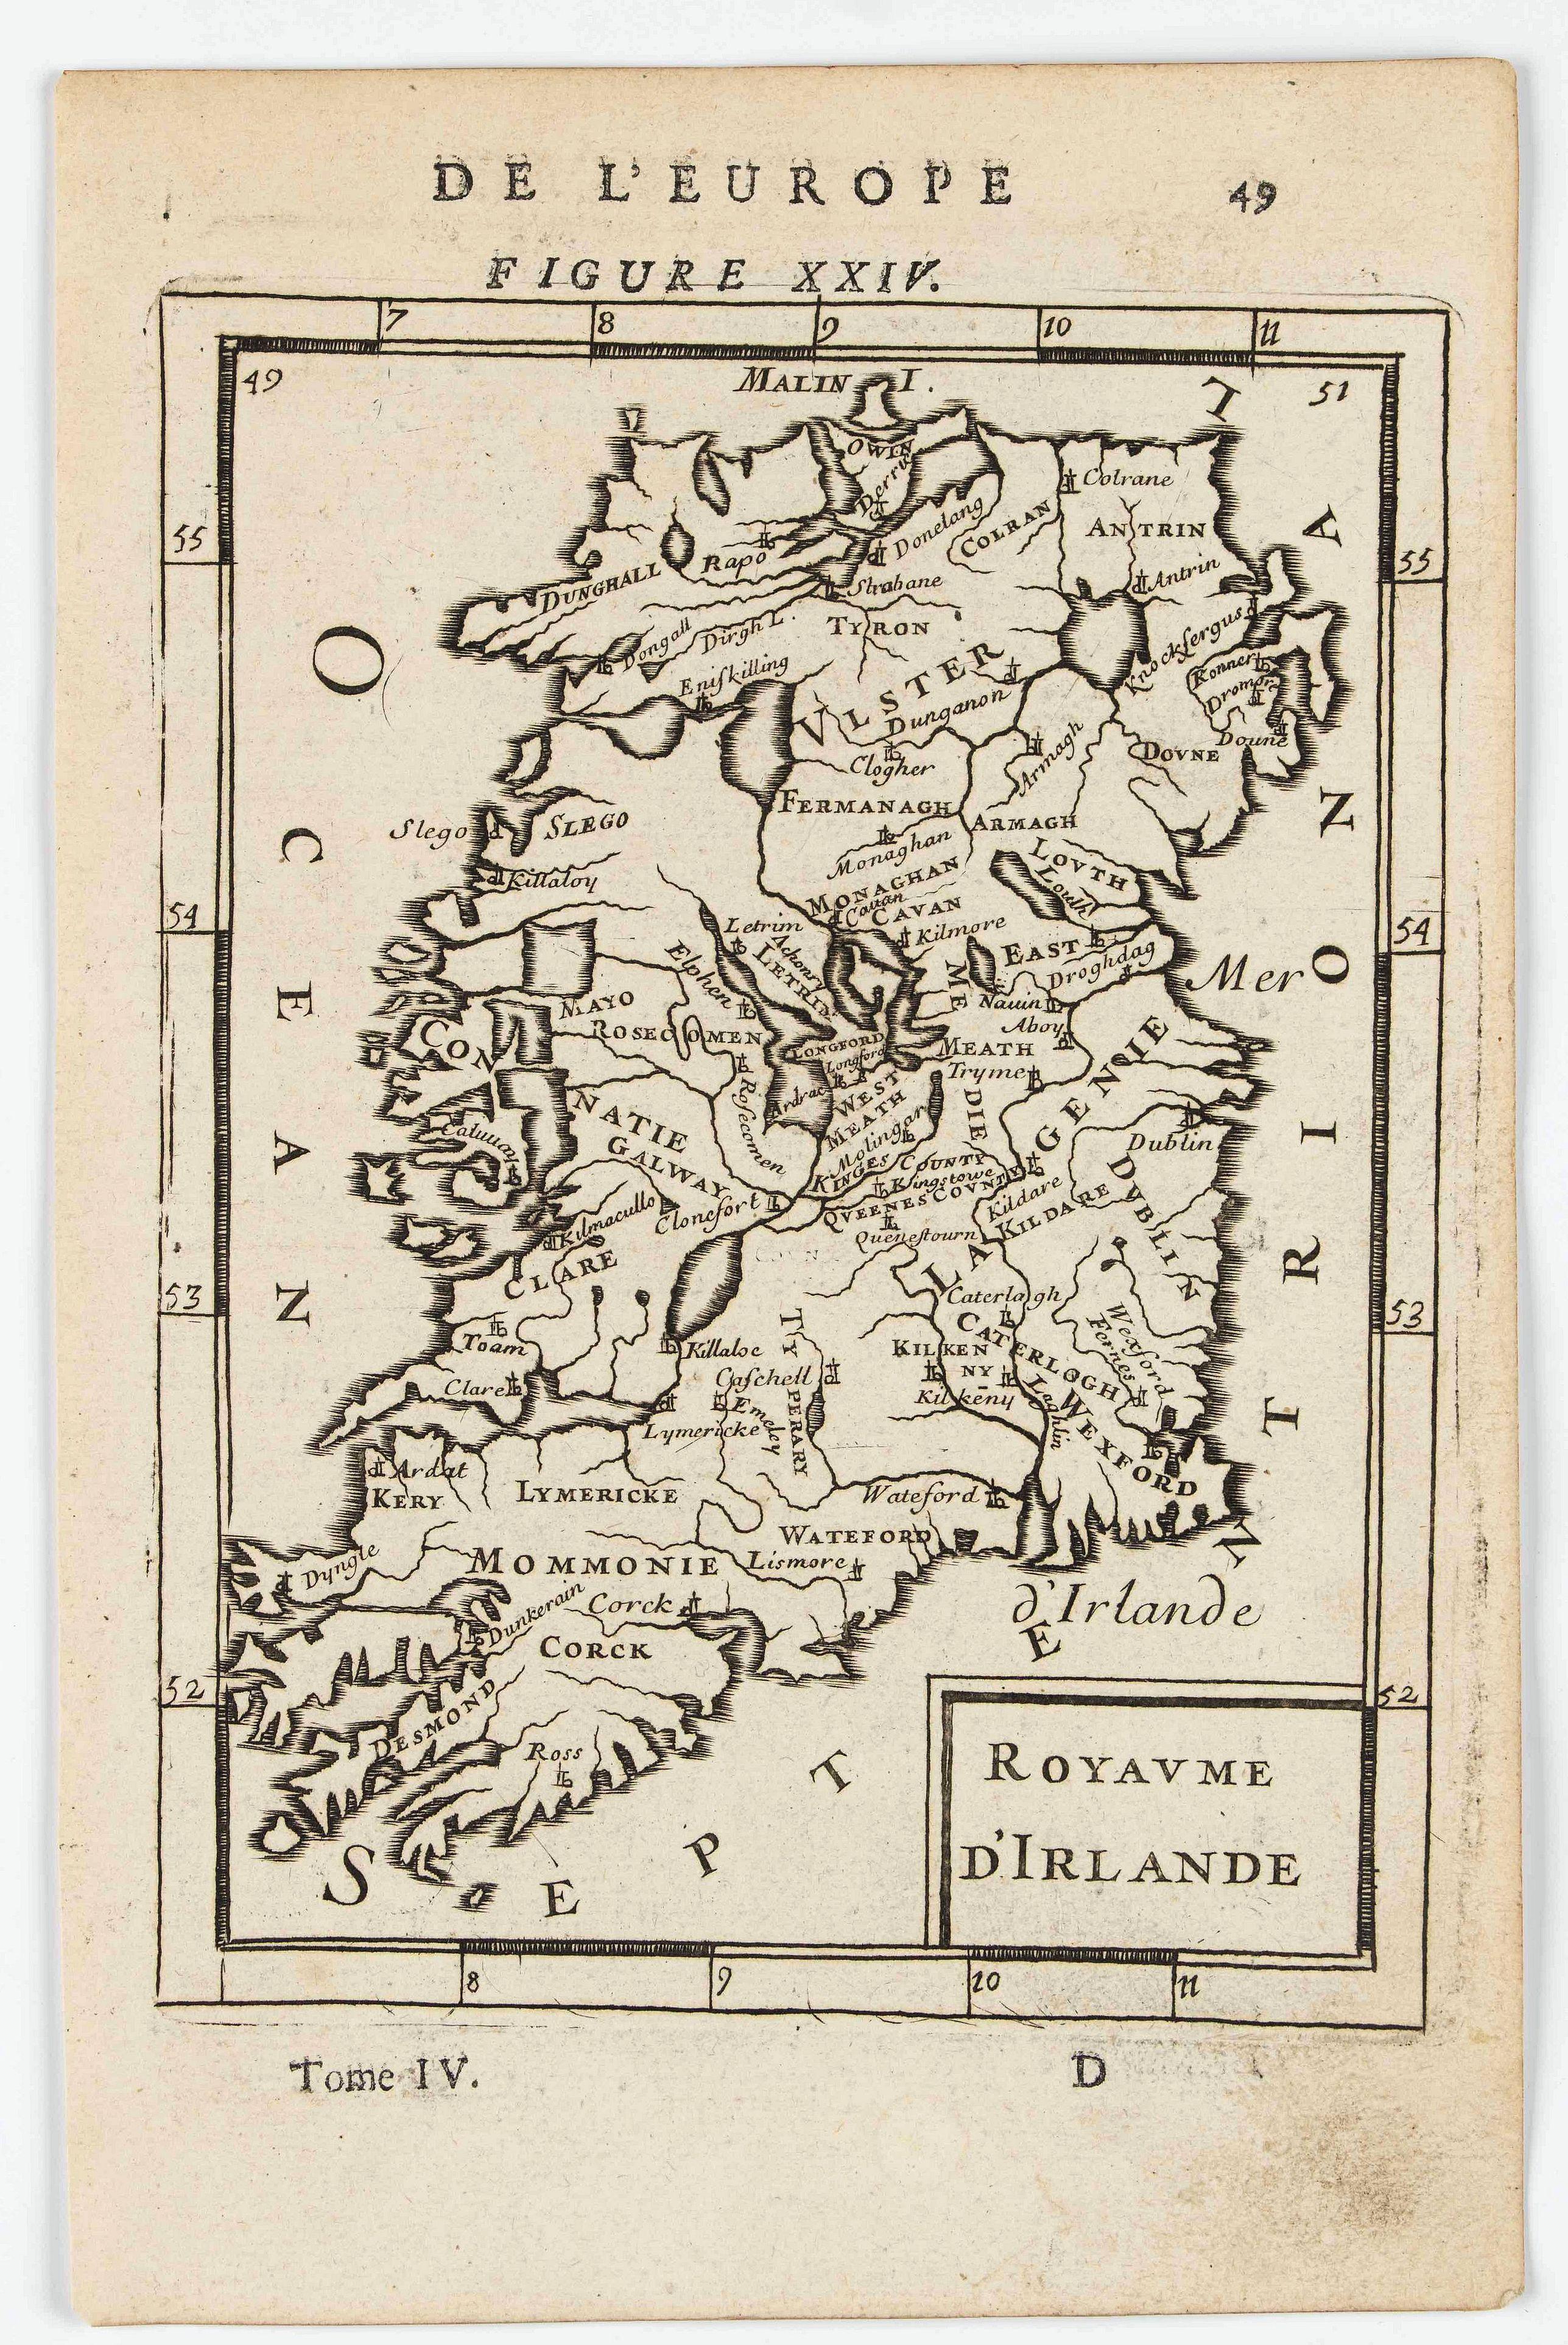 MANESSON MALLET, A. -  Royaume d'Irlande (Kingsom of Ireland).